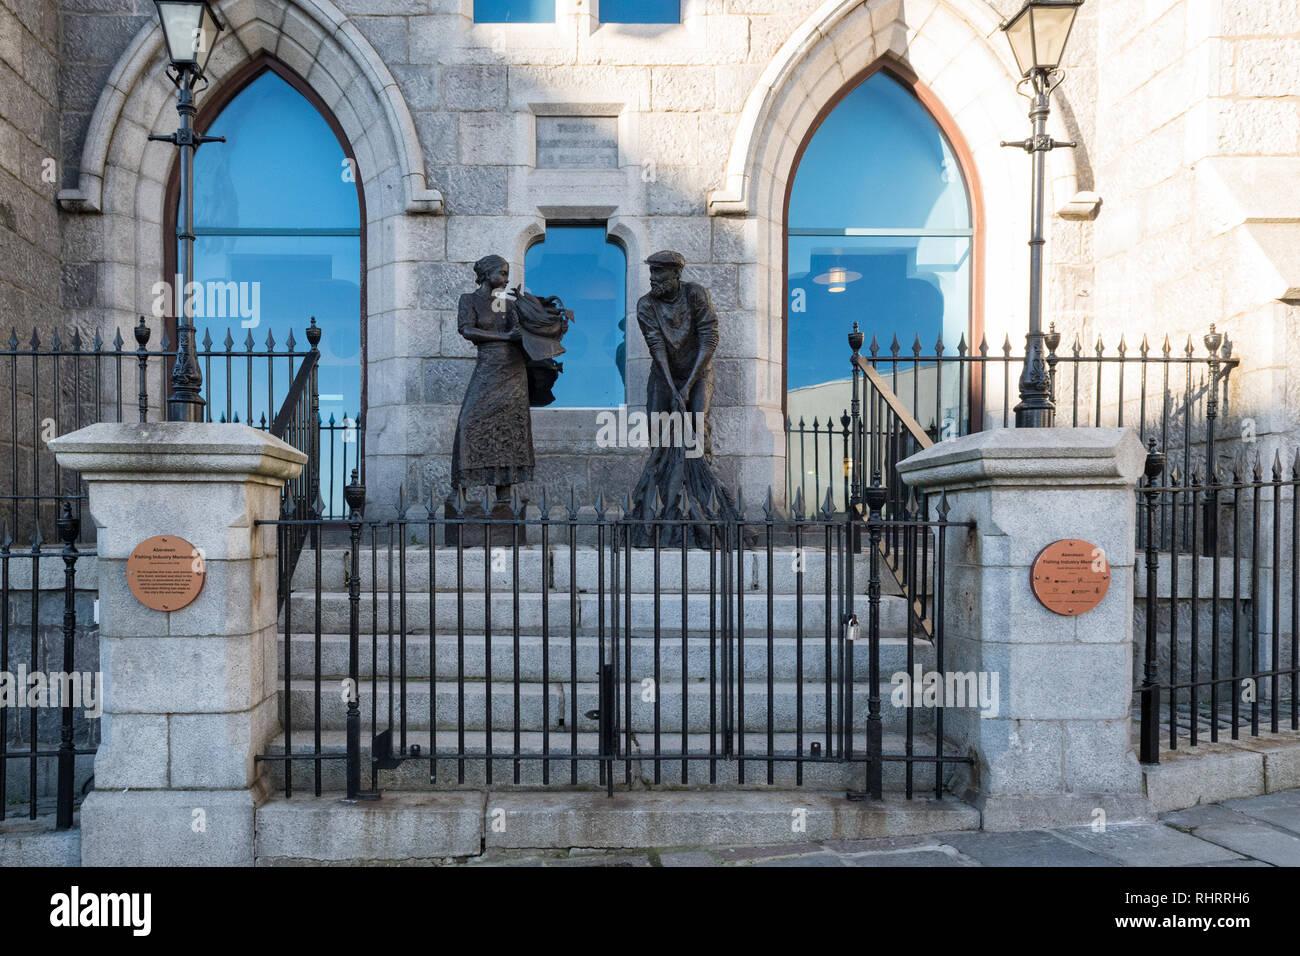 Aberdeen fishing industry memorial outside the Maritime Museum, Shiprow, Aberdeen, Scotland, UK - Stock Image